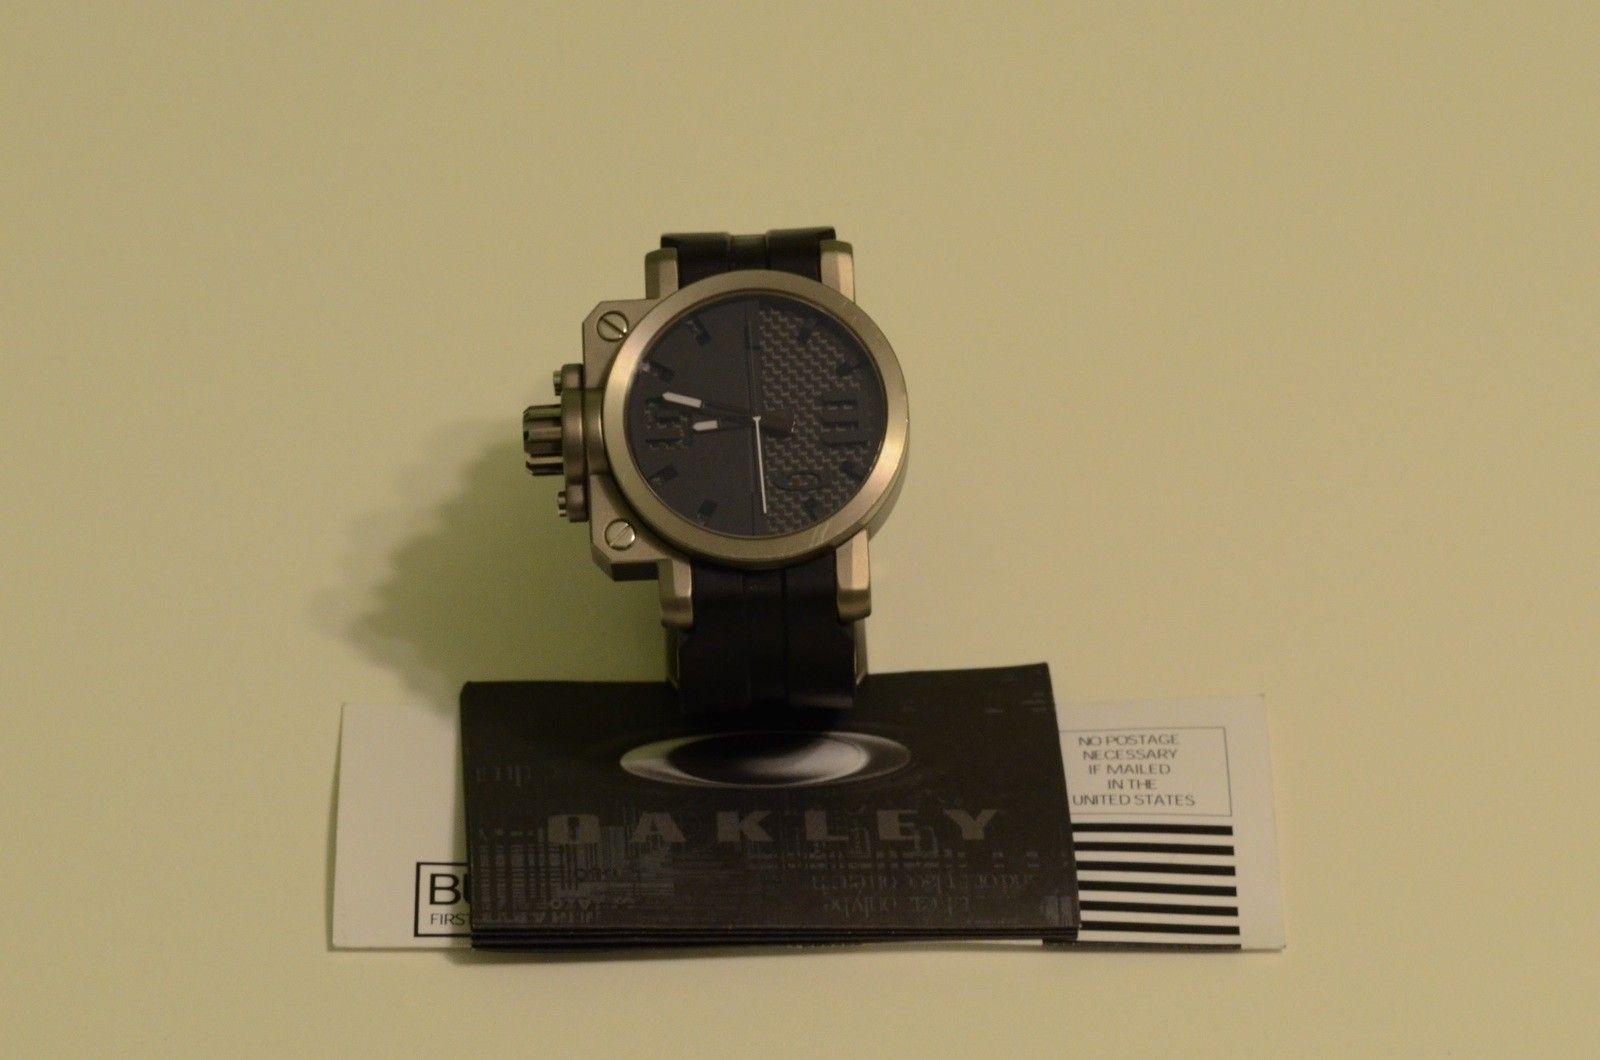 Gearbox Brushed Titanium- Carbon Fiber Dial SOLD! - DSC_0440.JPG